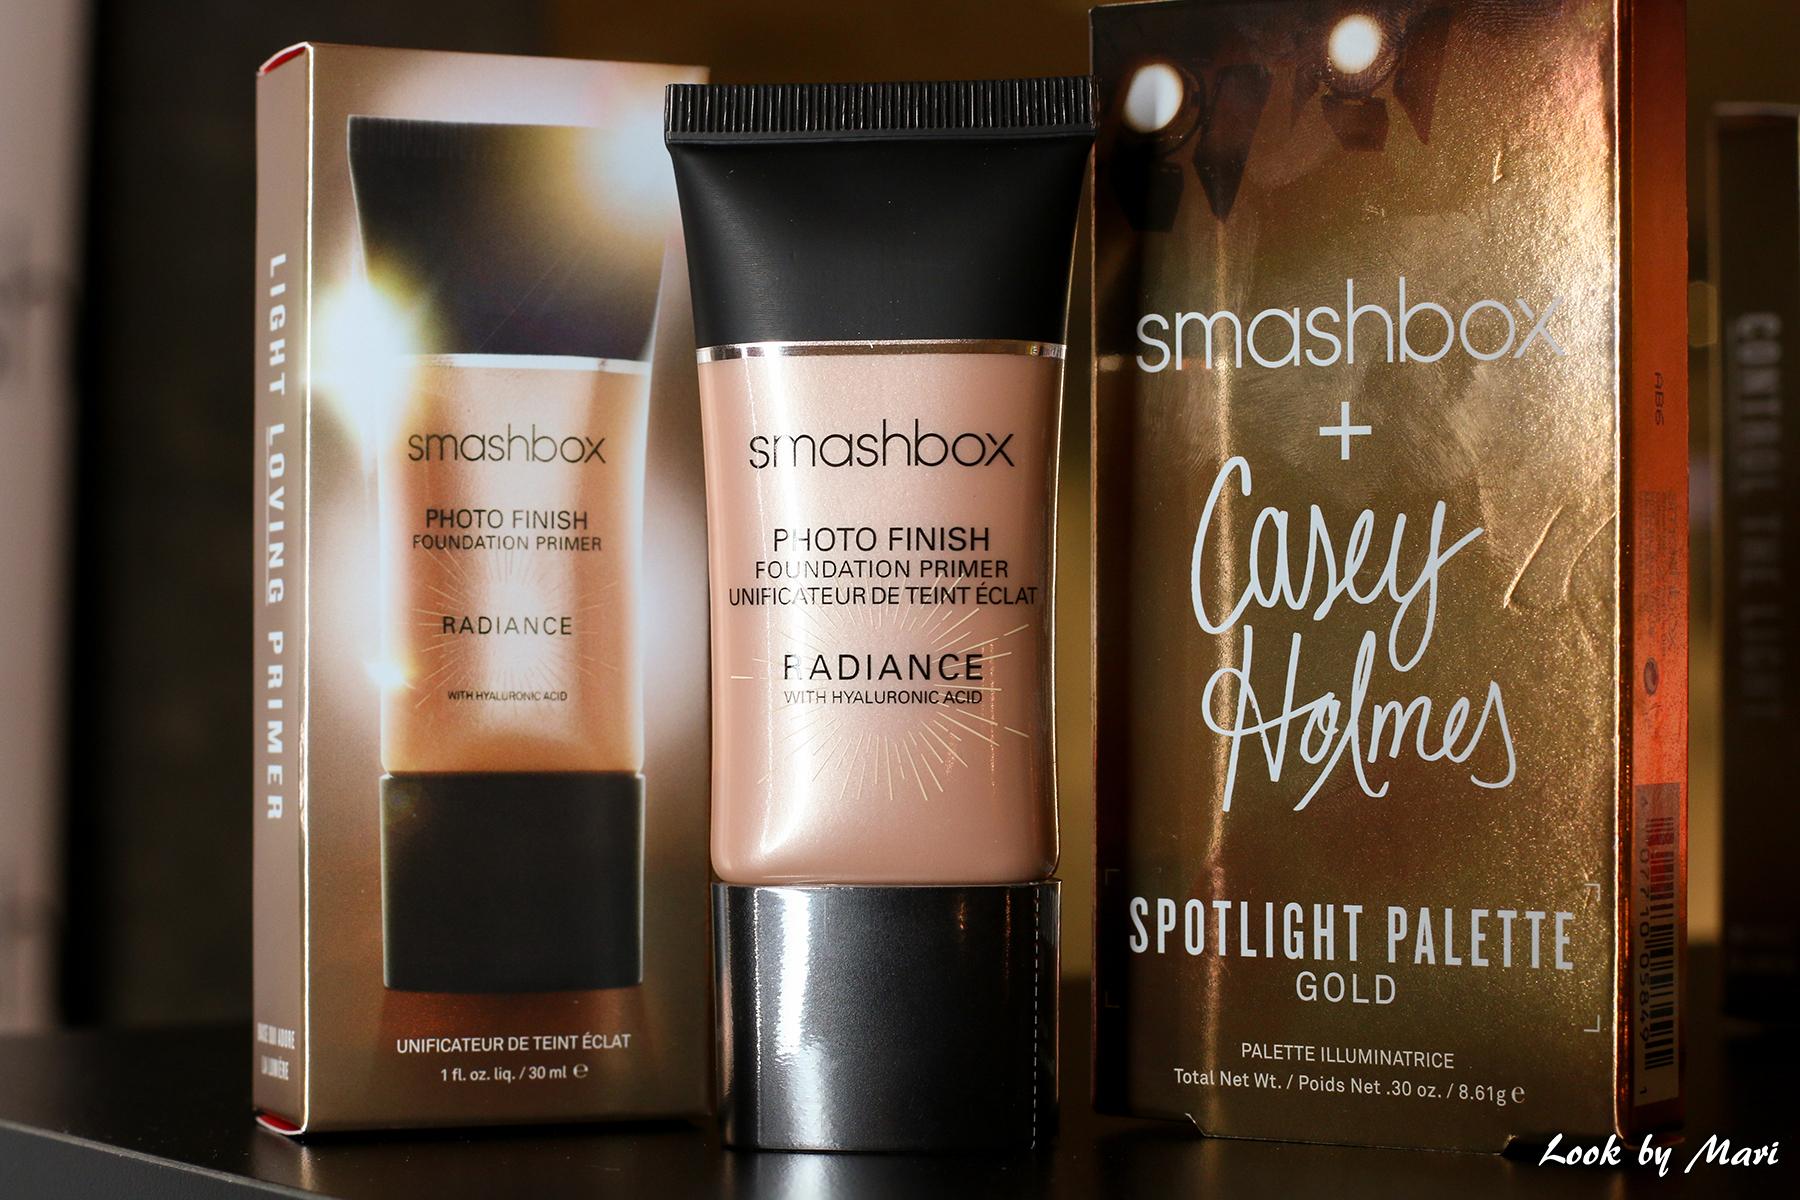 1 Smashbox x casey holmes Spotlight palette gold radiance primer review kokemuksia